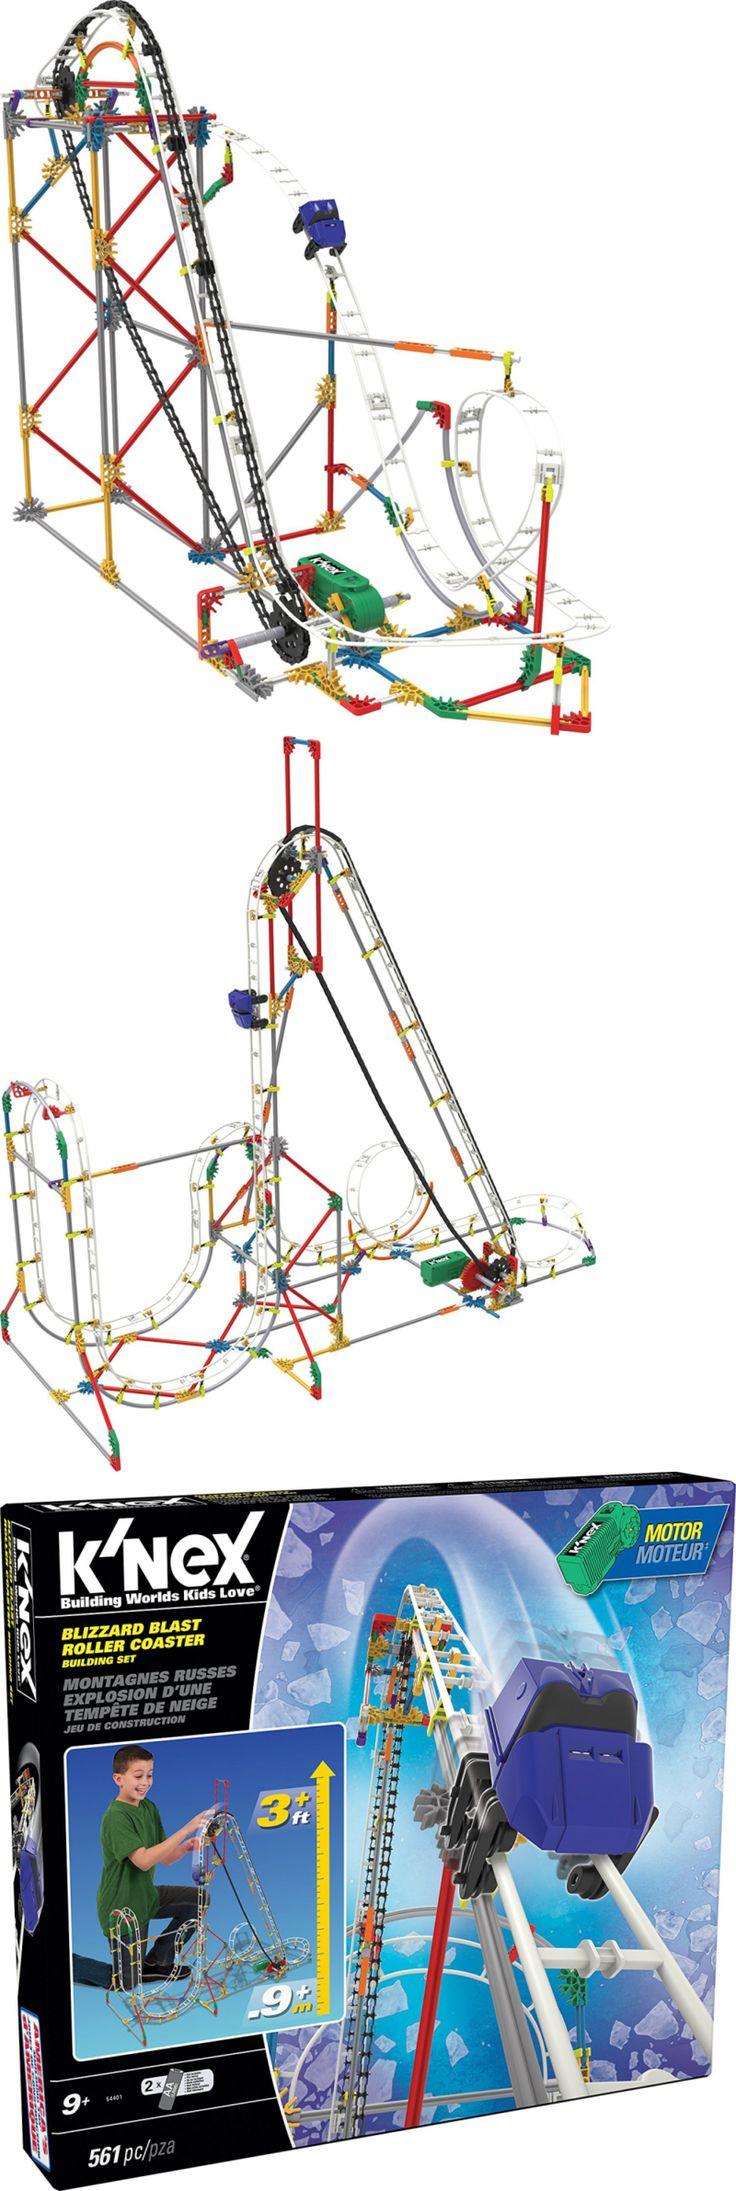 KNEX 21254: New Blizzard Blast Roller Coaster Building Set -> BUY IT NOW ONLY: $51.79 on eBay!